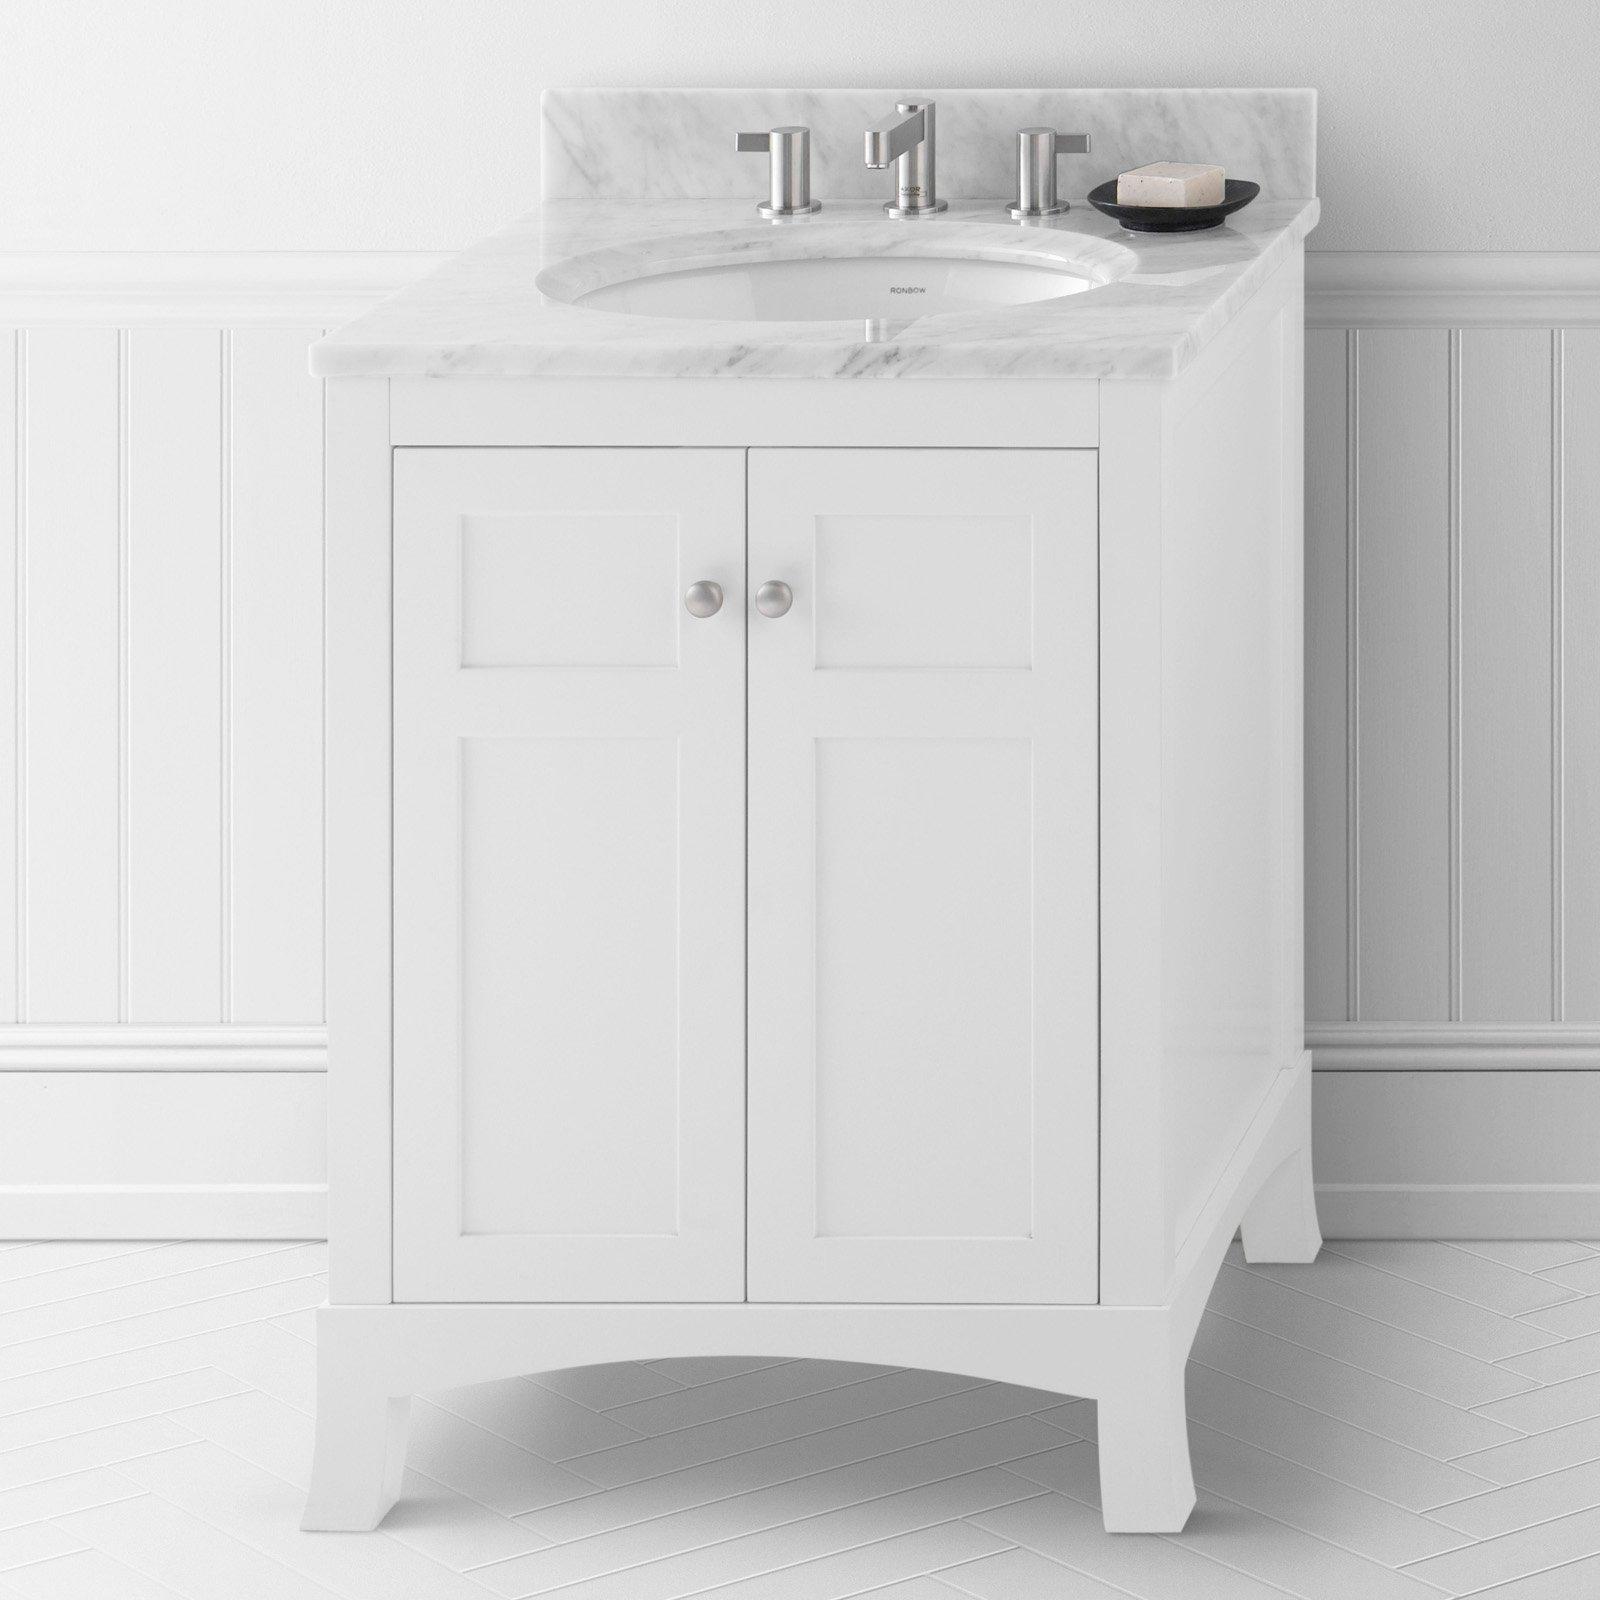 Ronbow 050524-3 Hampton 24 in. Single Bathroom Vanity